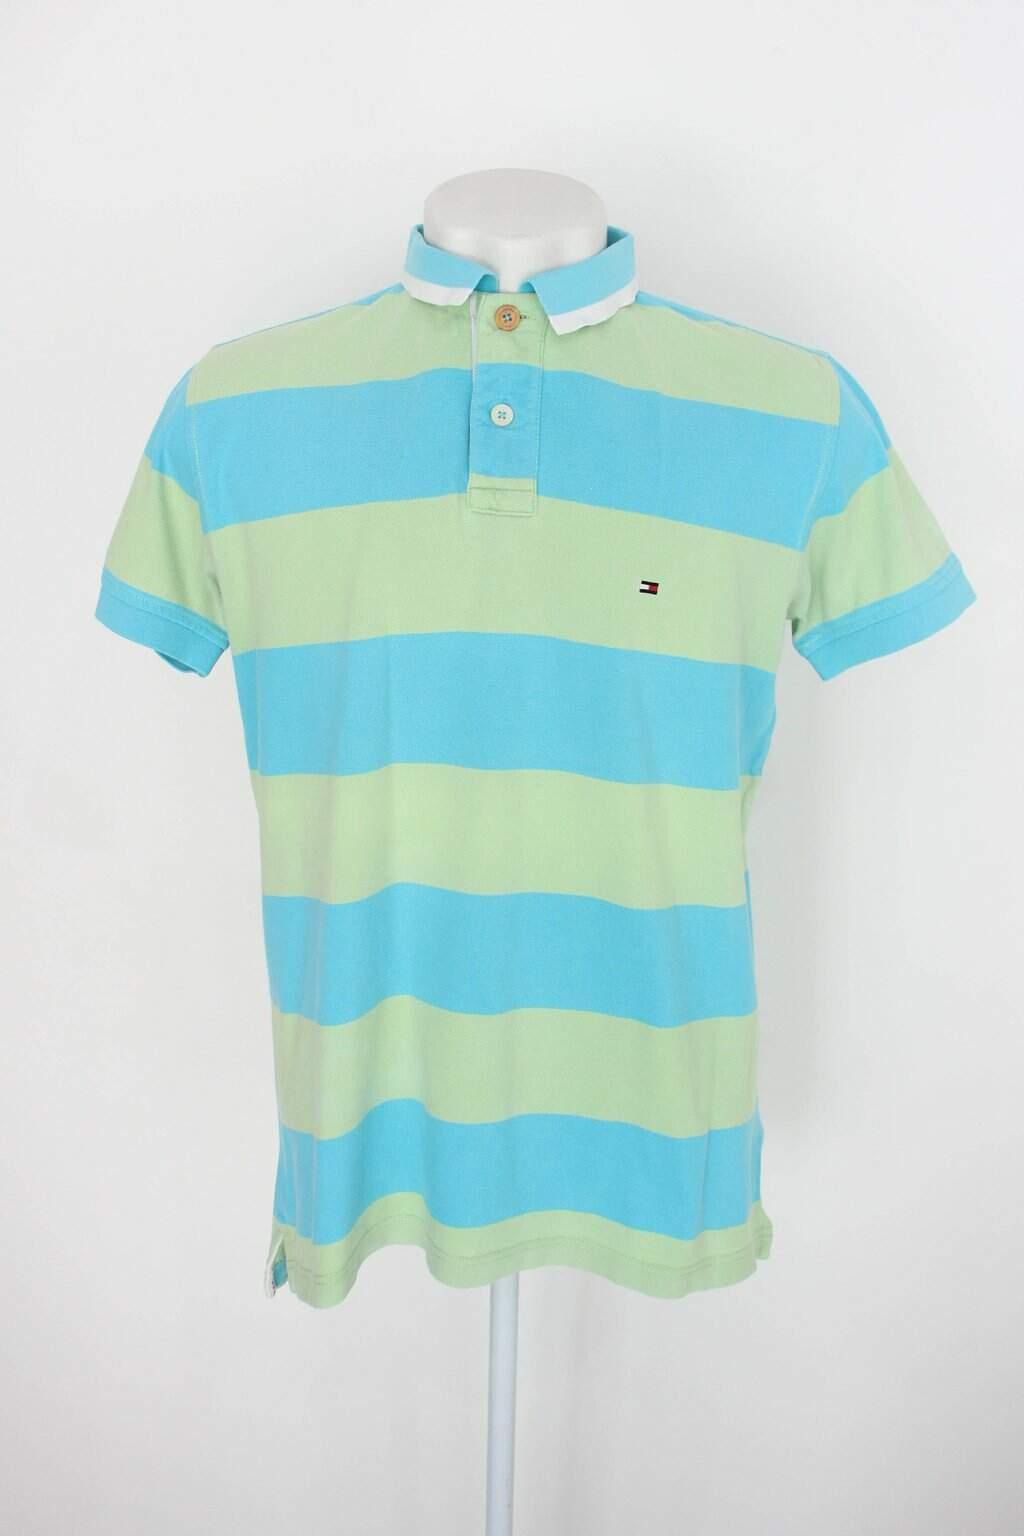 Camisa Polo Tommy Hilfiger Masculina Listrada Verde E Azul